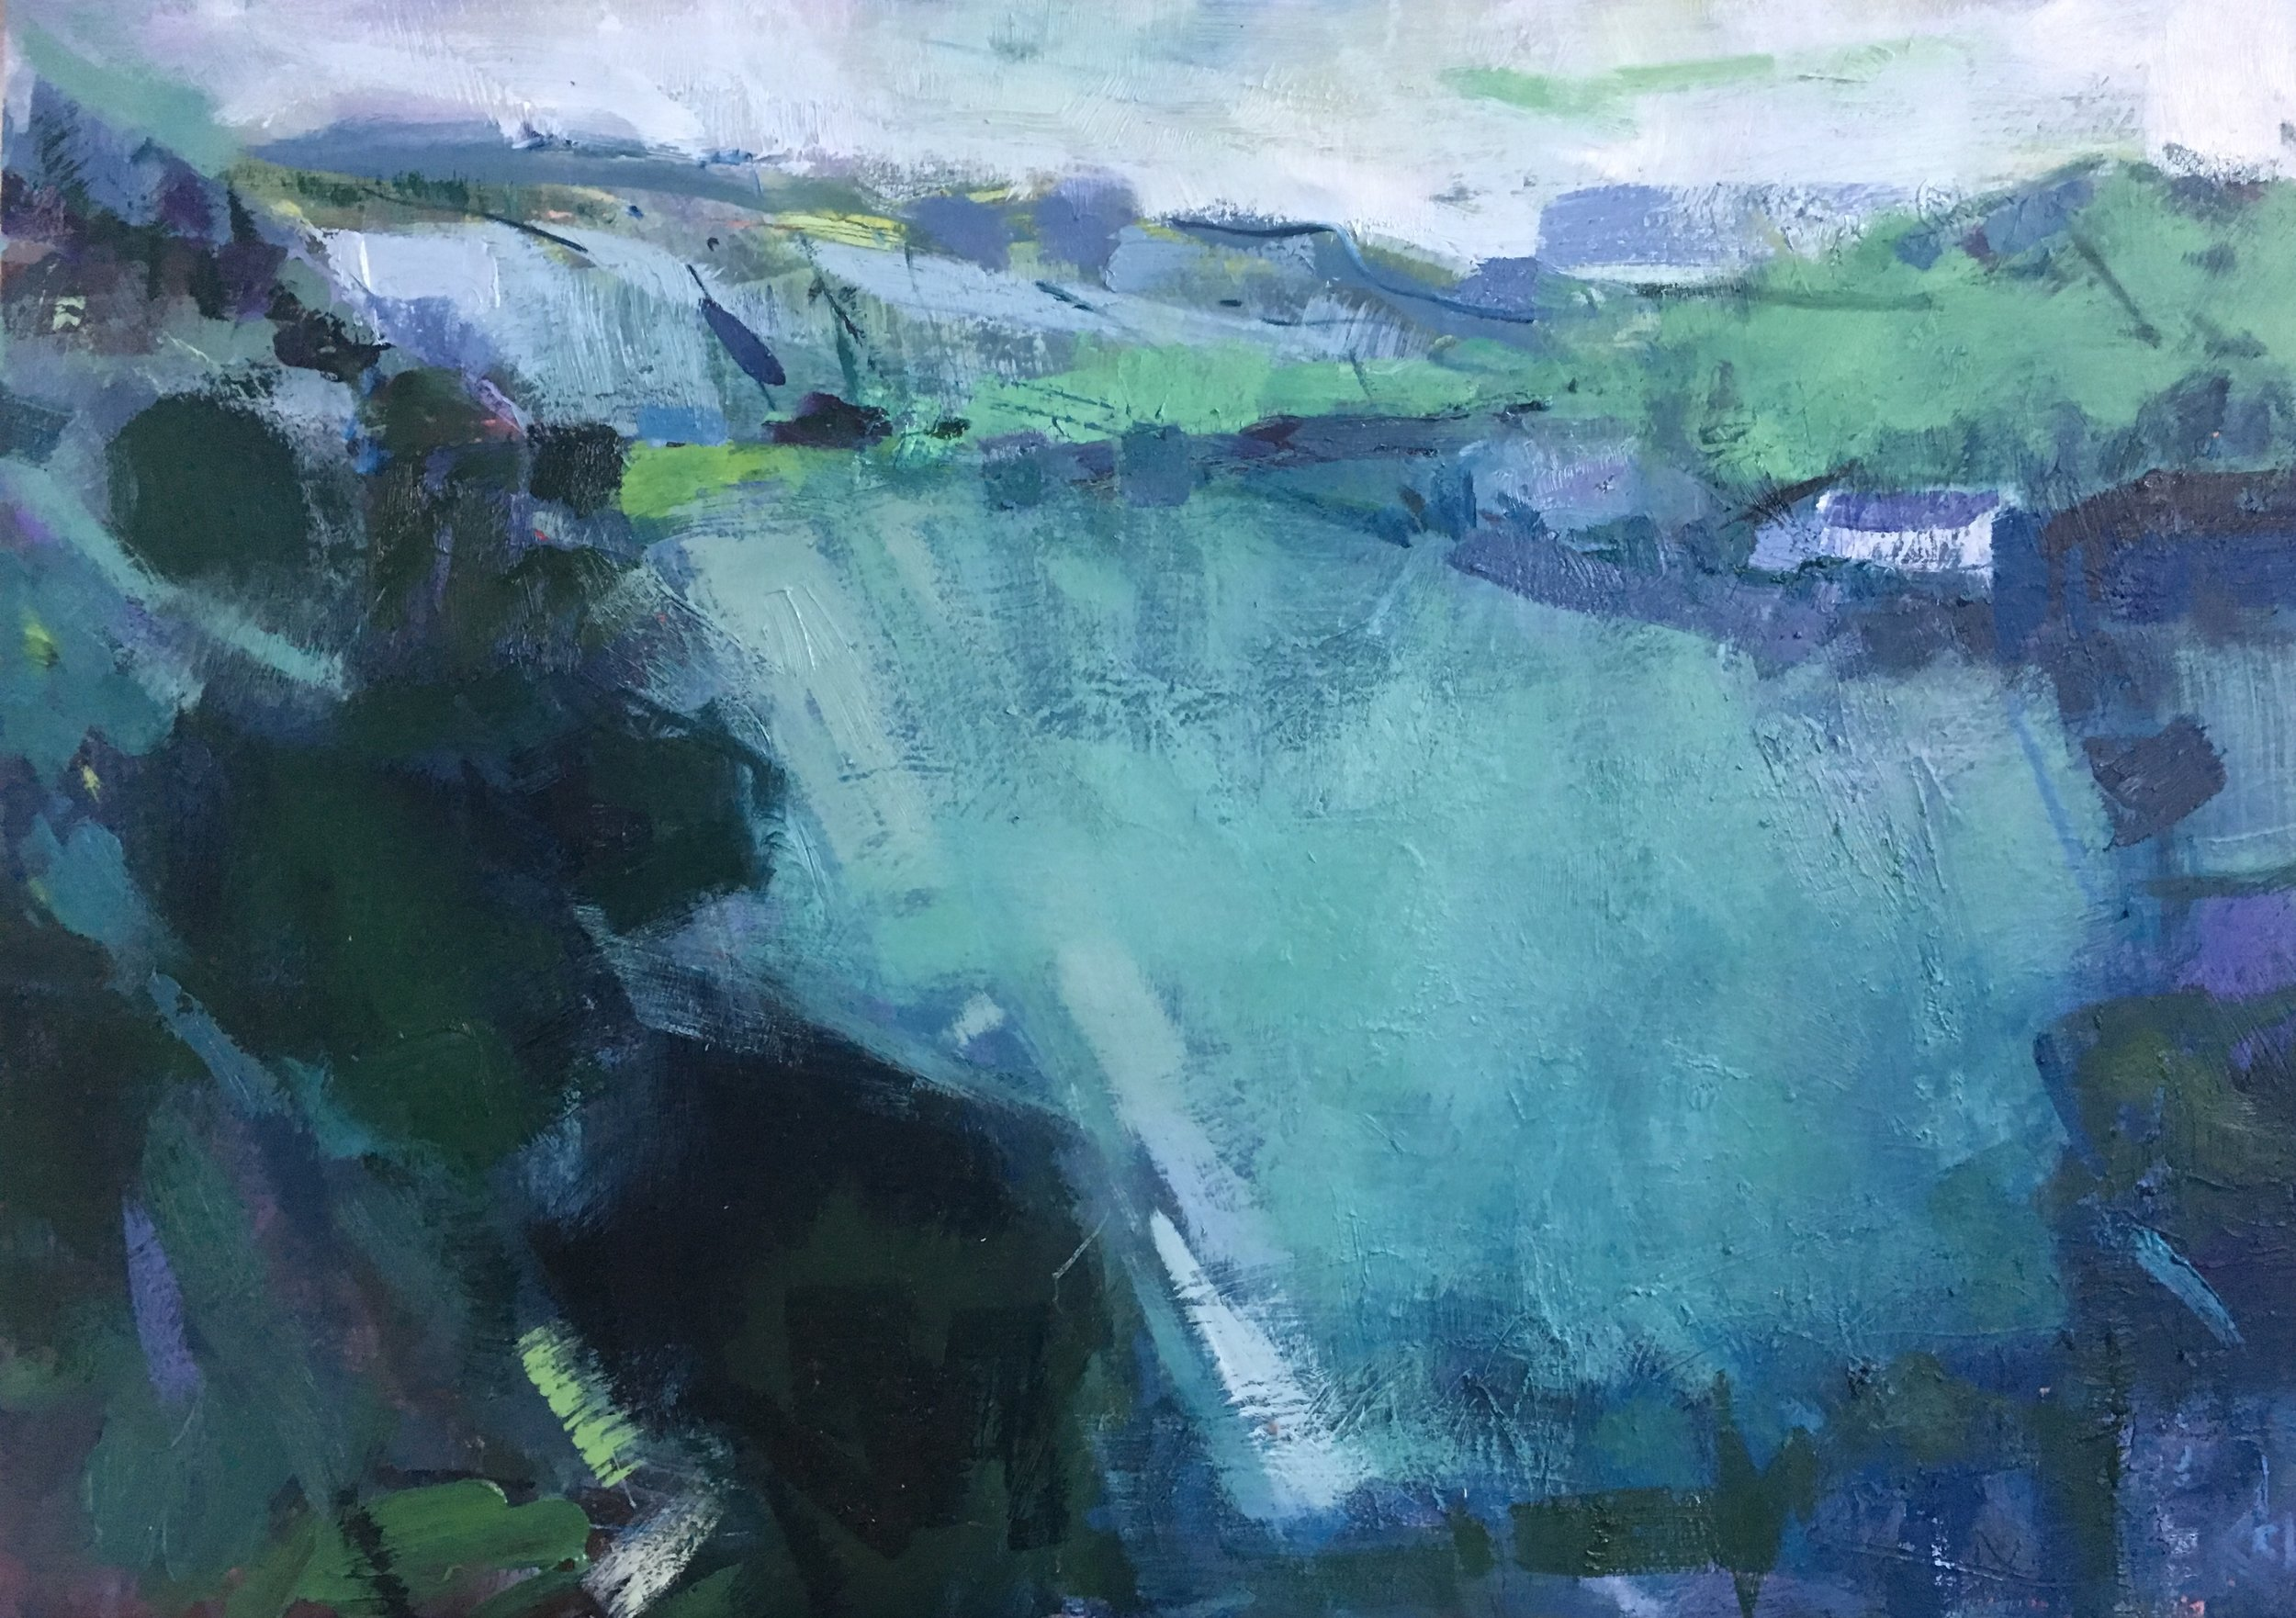 Towards Llanfyllin  oil on canvas. 50 x 60 cm